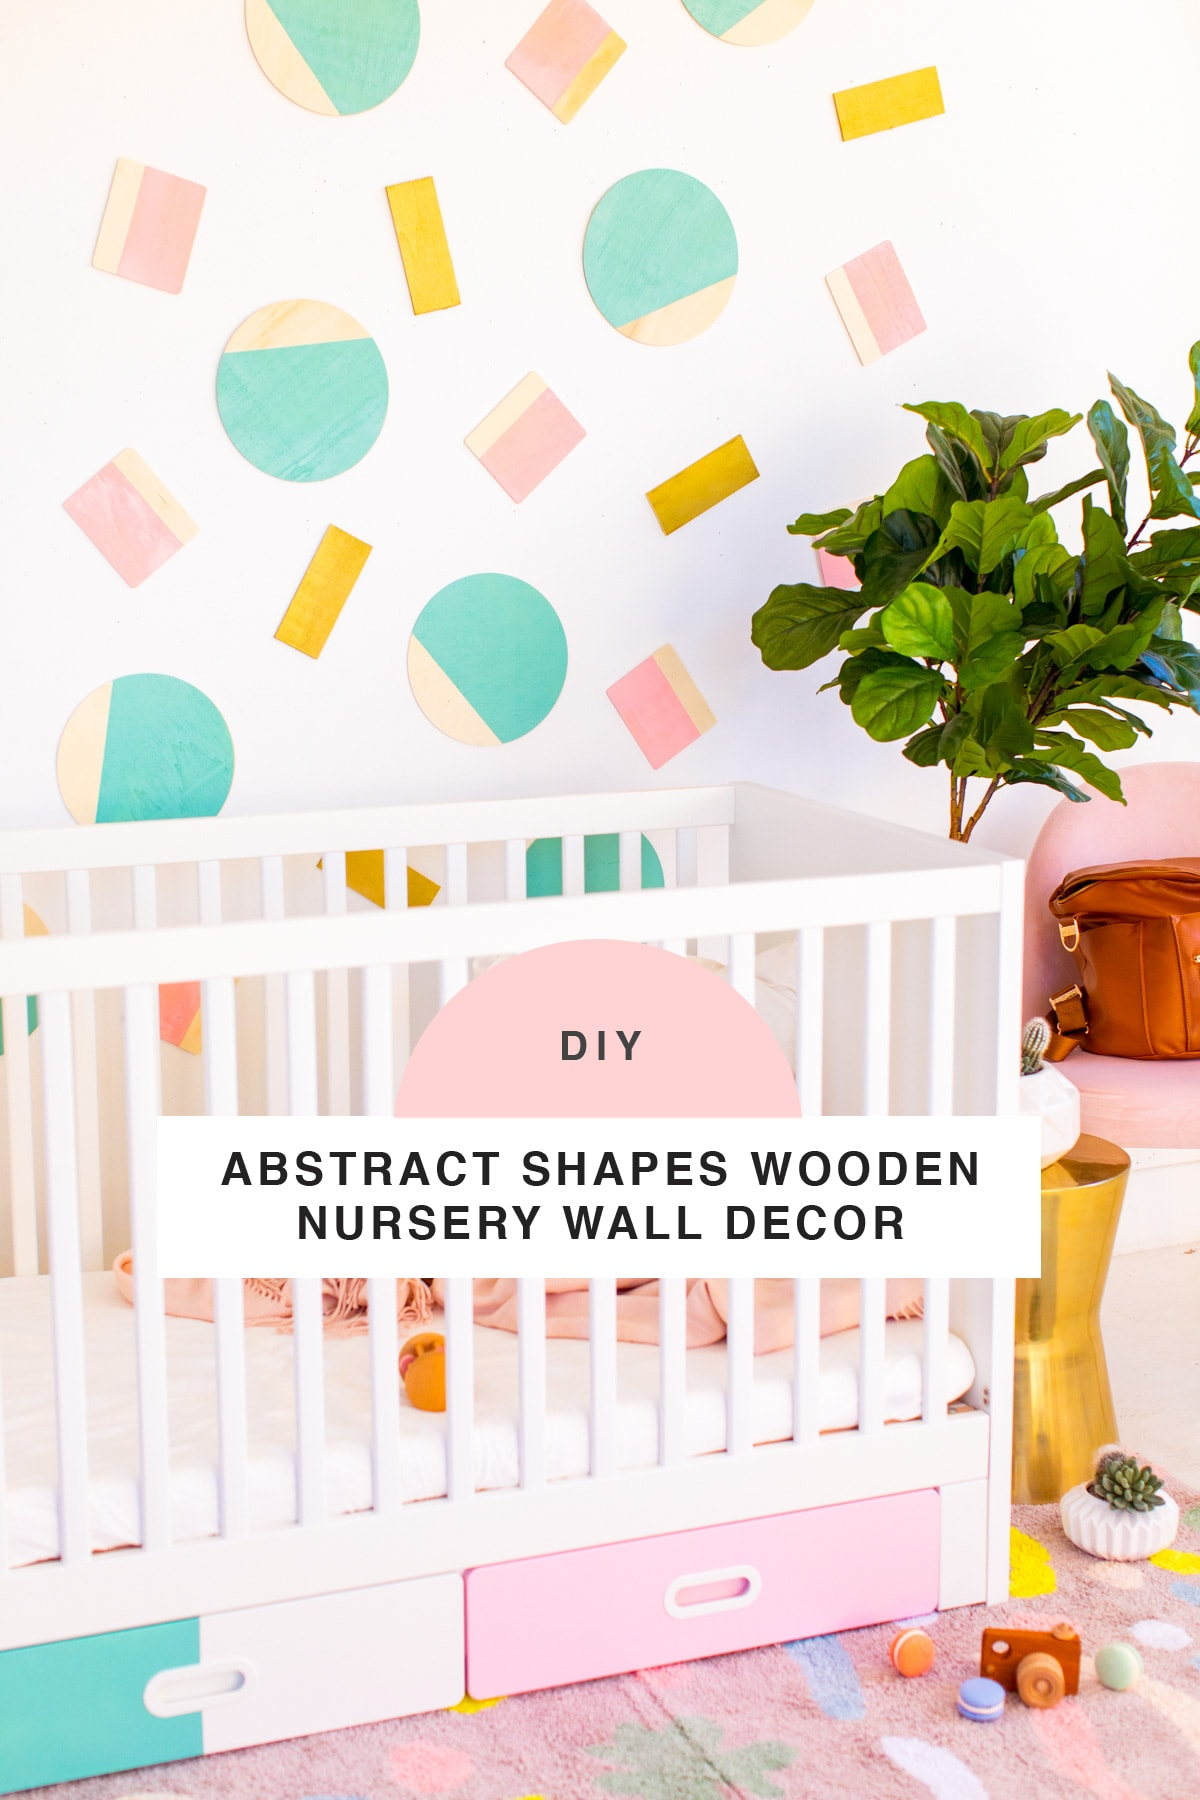 Abstract Shapes DIY Nursery Wall Decor by Houston lifestyle blogger Ashley Rose of Sugar and Cloth -- #DIYBABYROOMDECOR #KRYLON #SPRAYPAINTPROJECT #NURSERYIDEAS